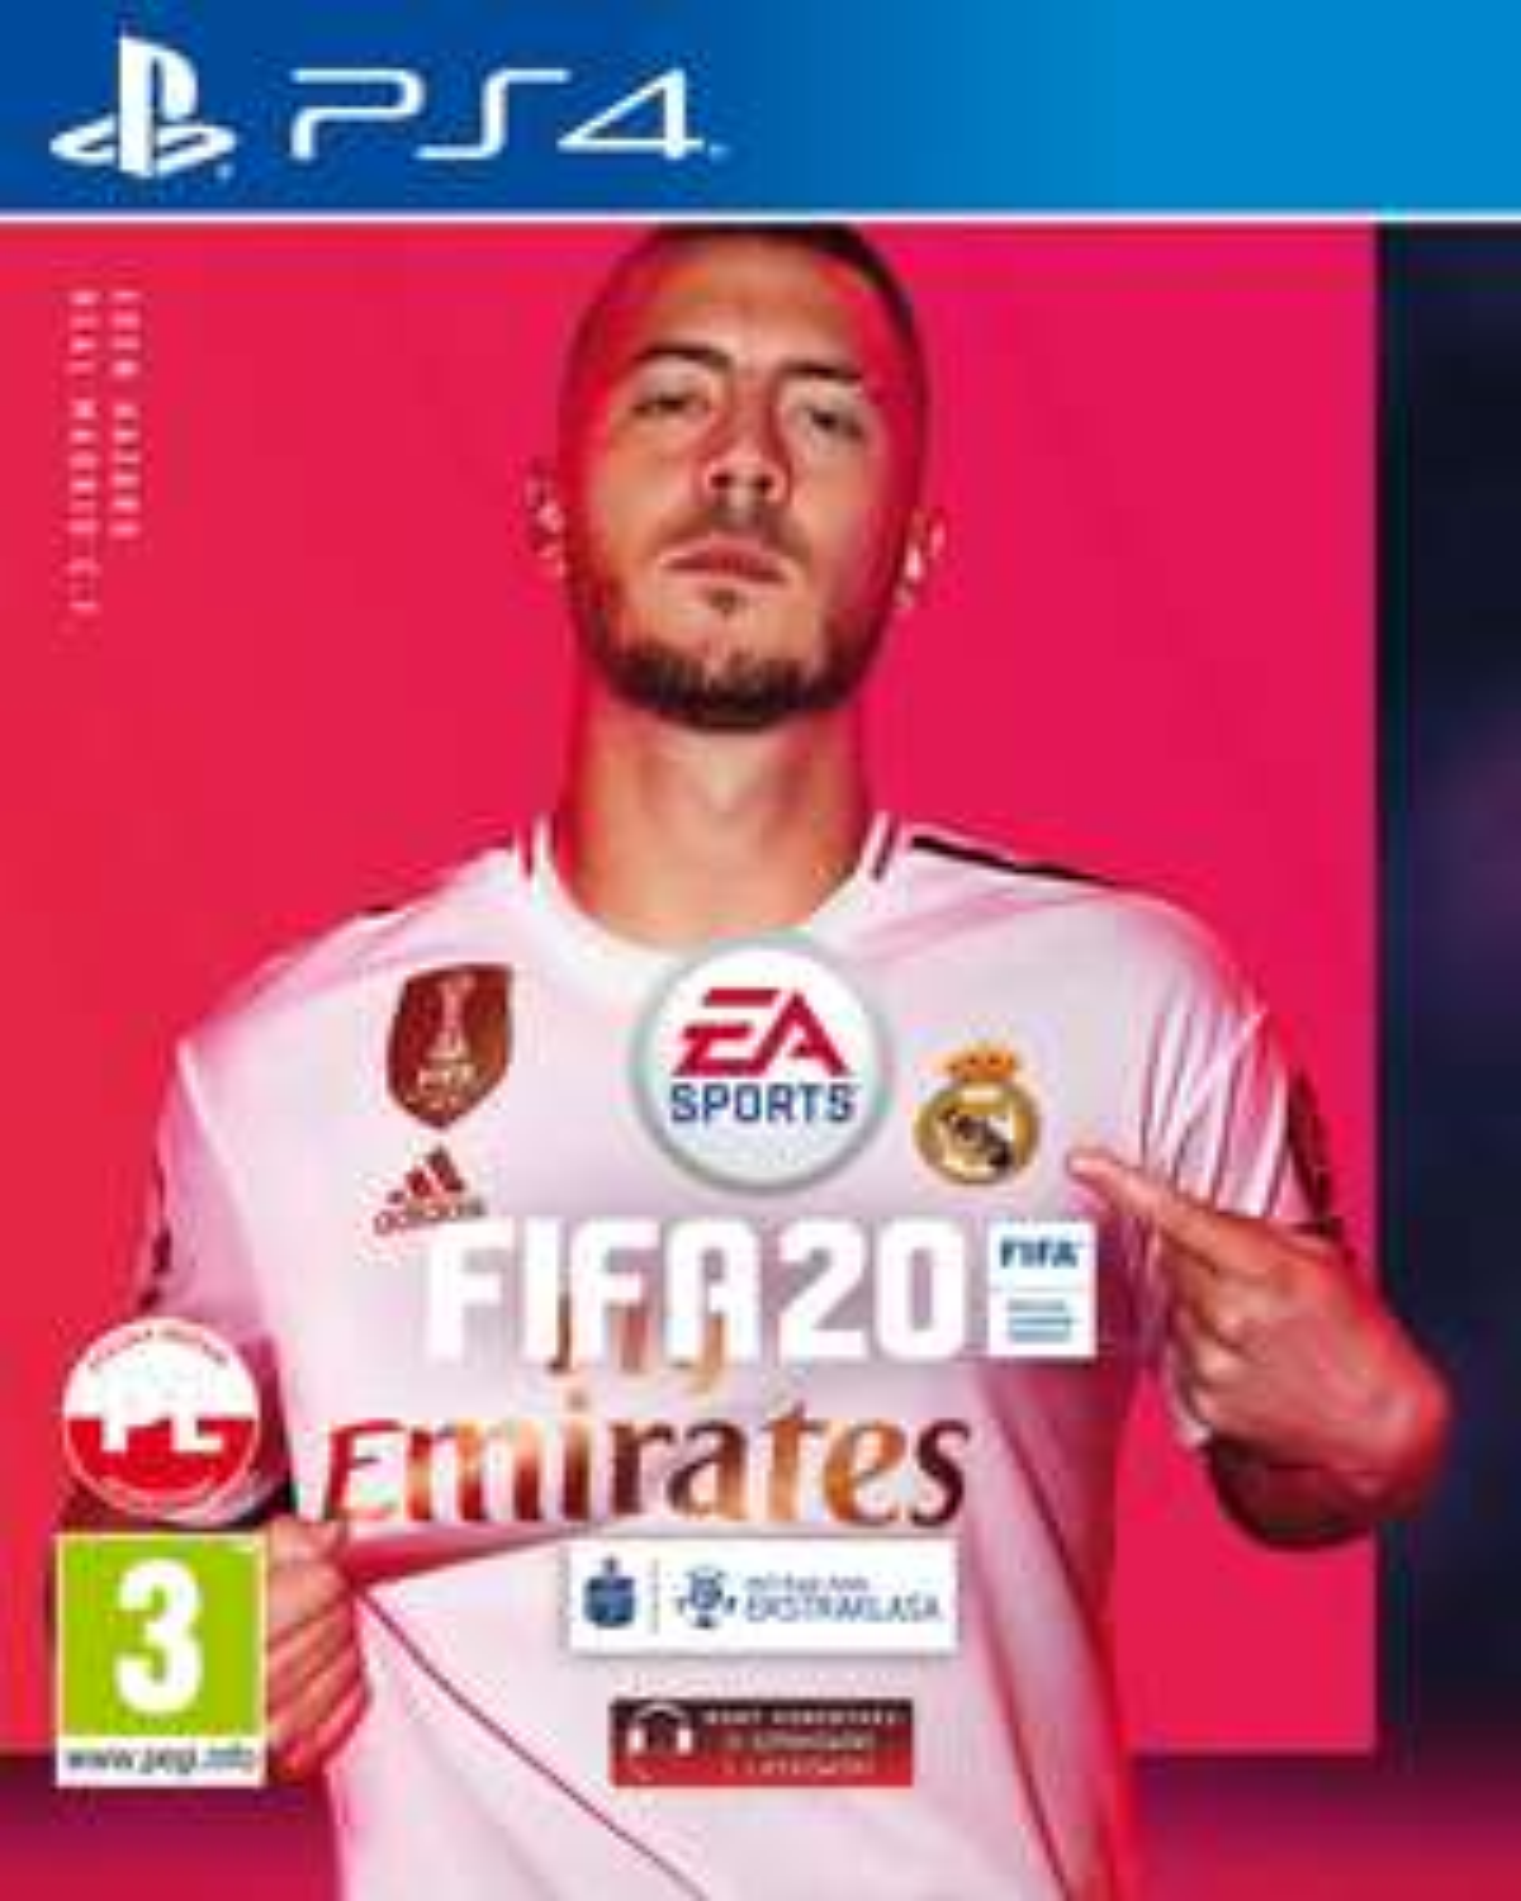 FIFA 20 na PS4, Xbox One oraz PC (+ gratis figurka DOMEZ) @MedaExpert